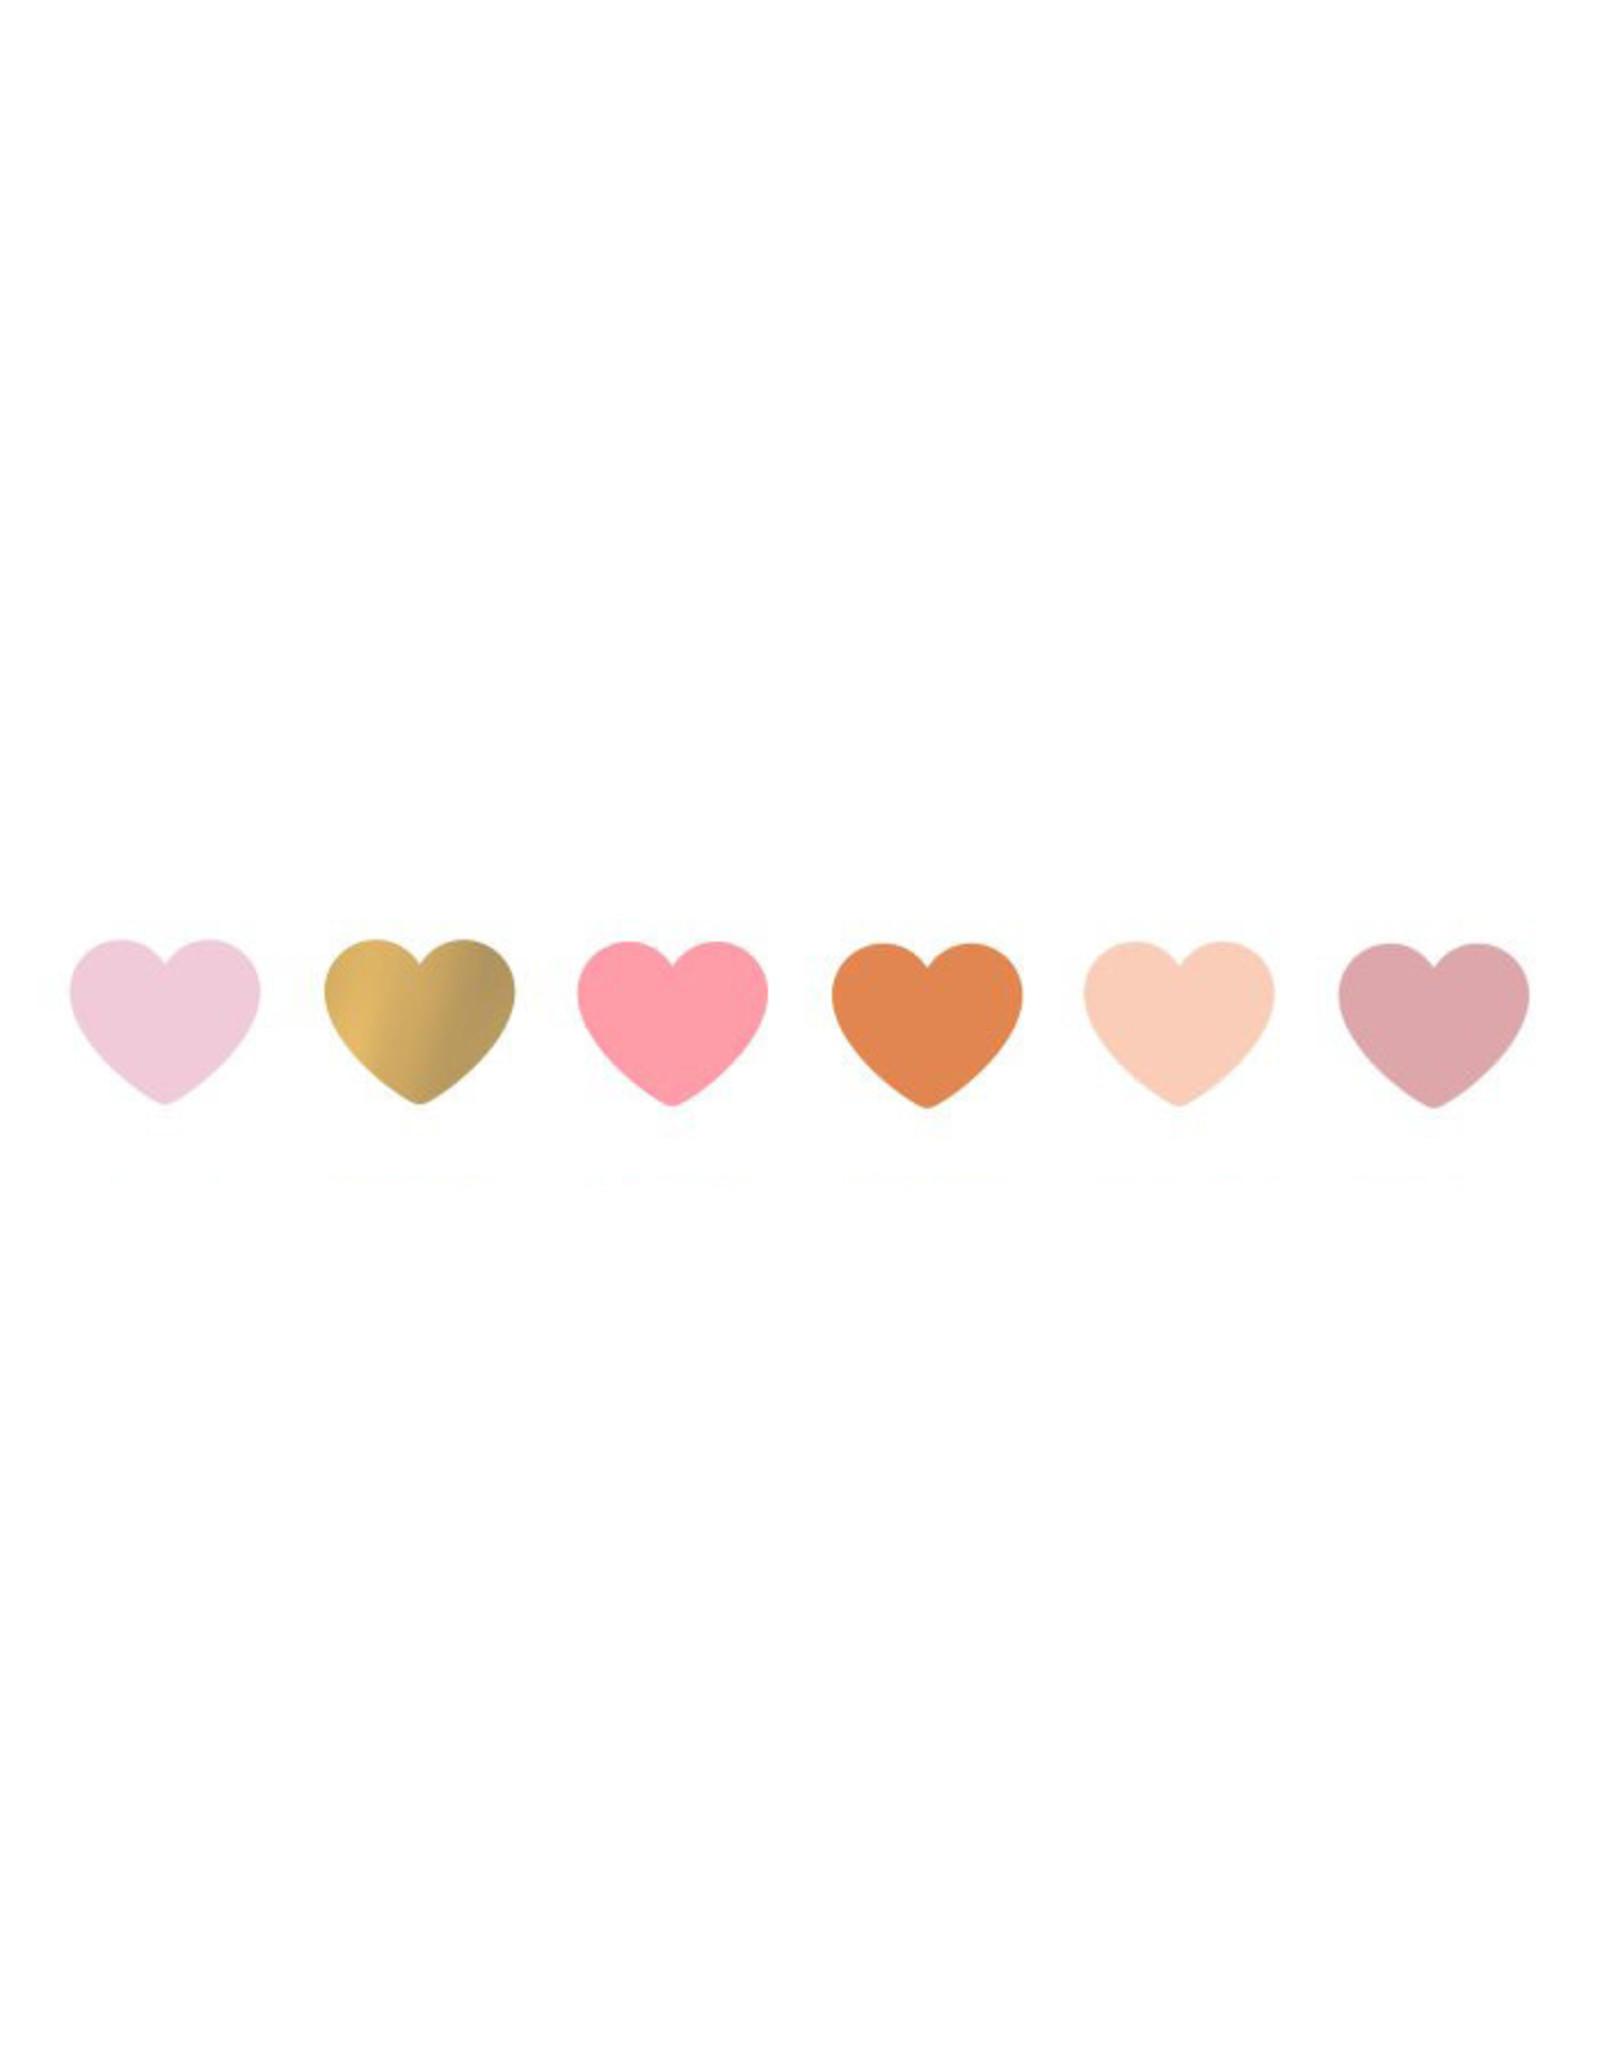 Stickers 6st. hart mini roze/goud